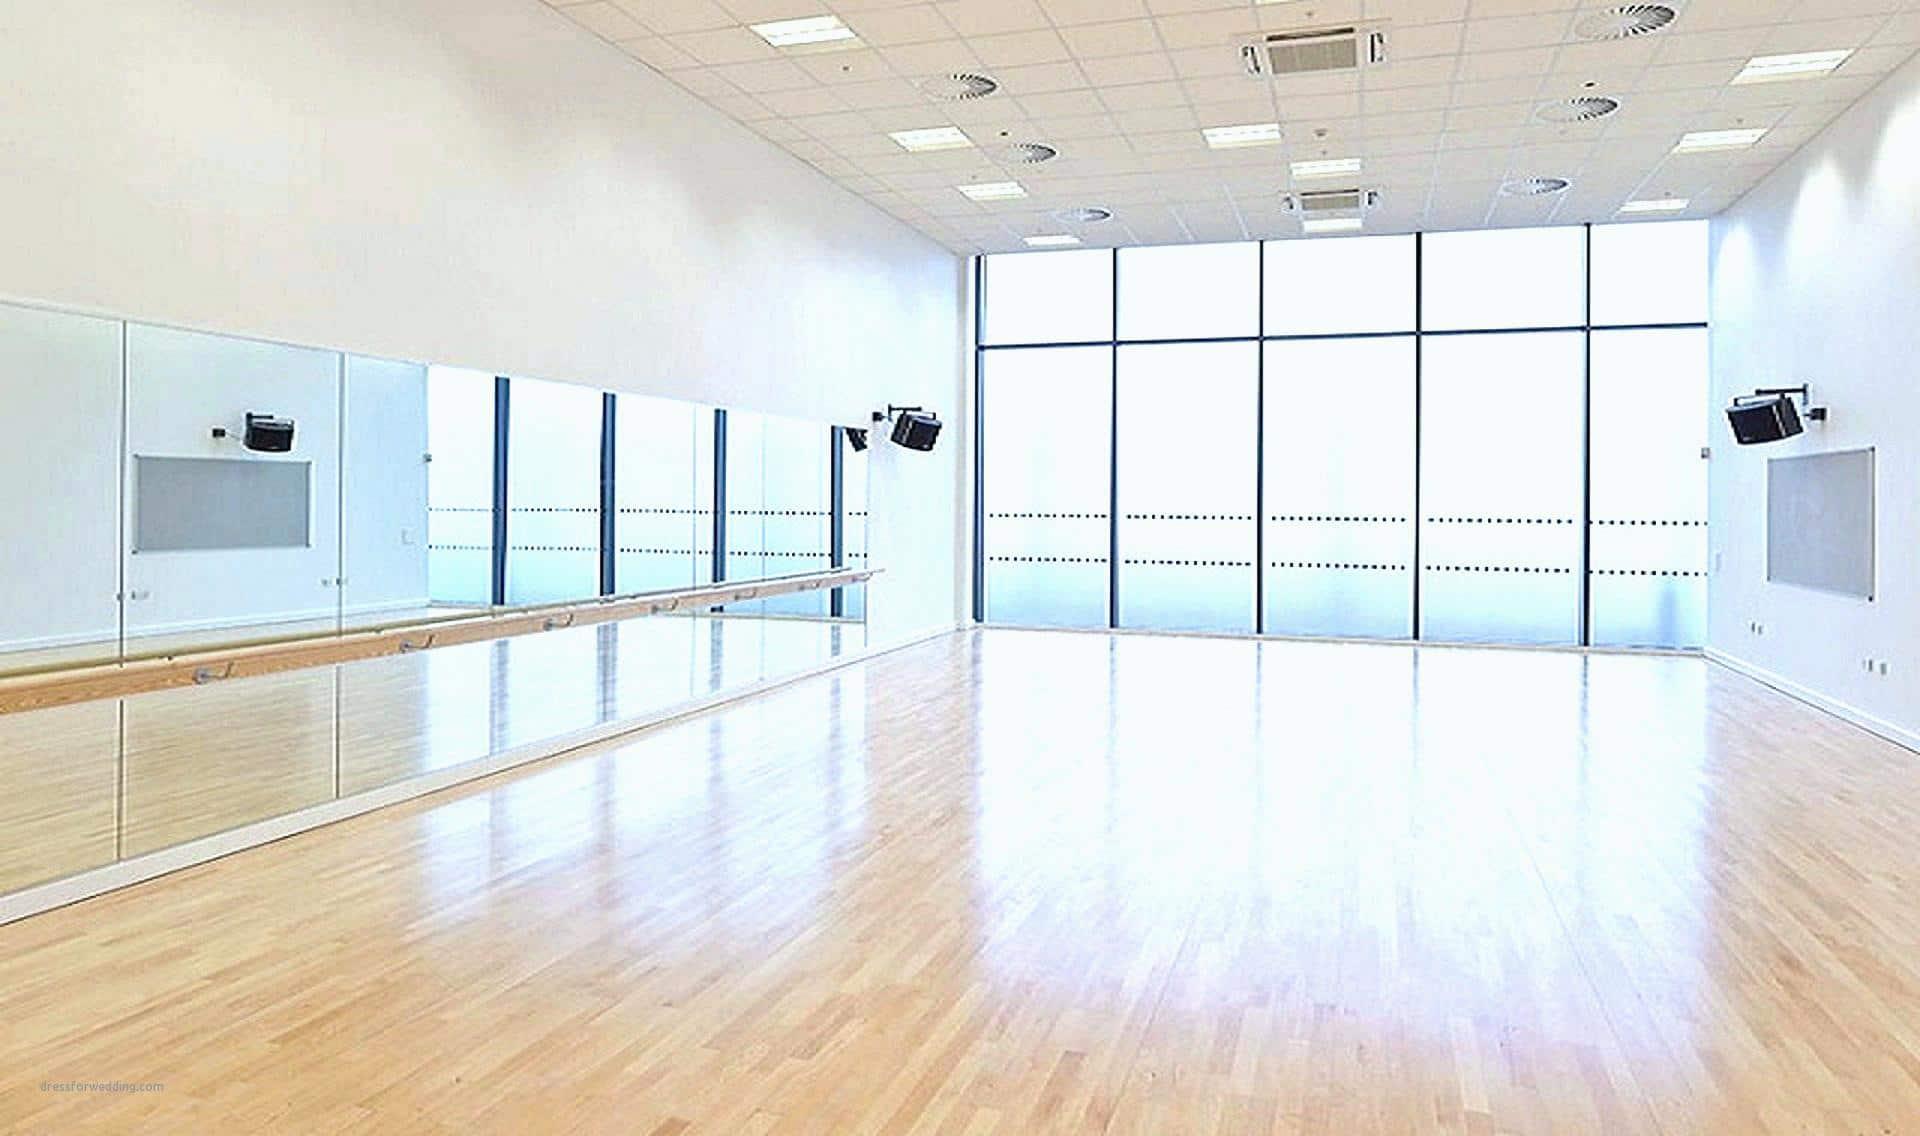 Gym Mirrors & Mirror Walls